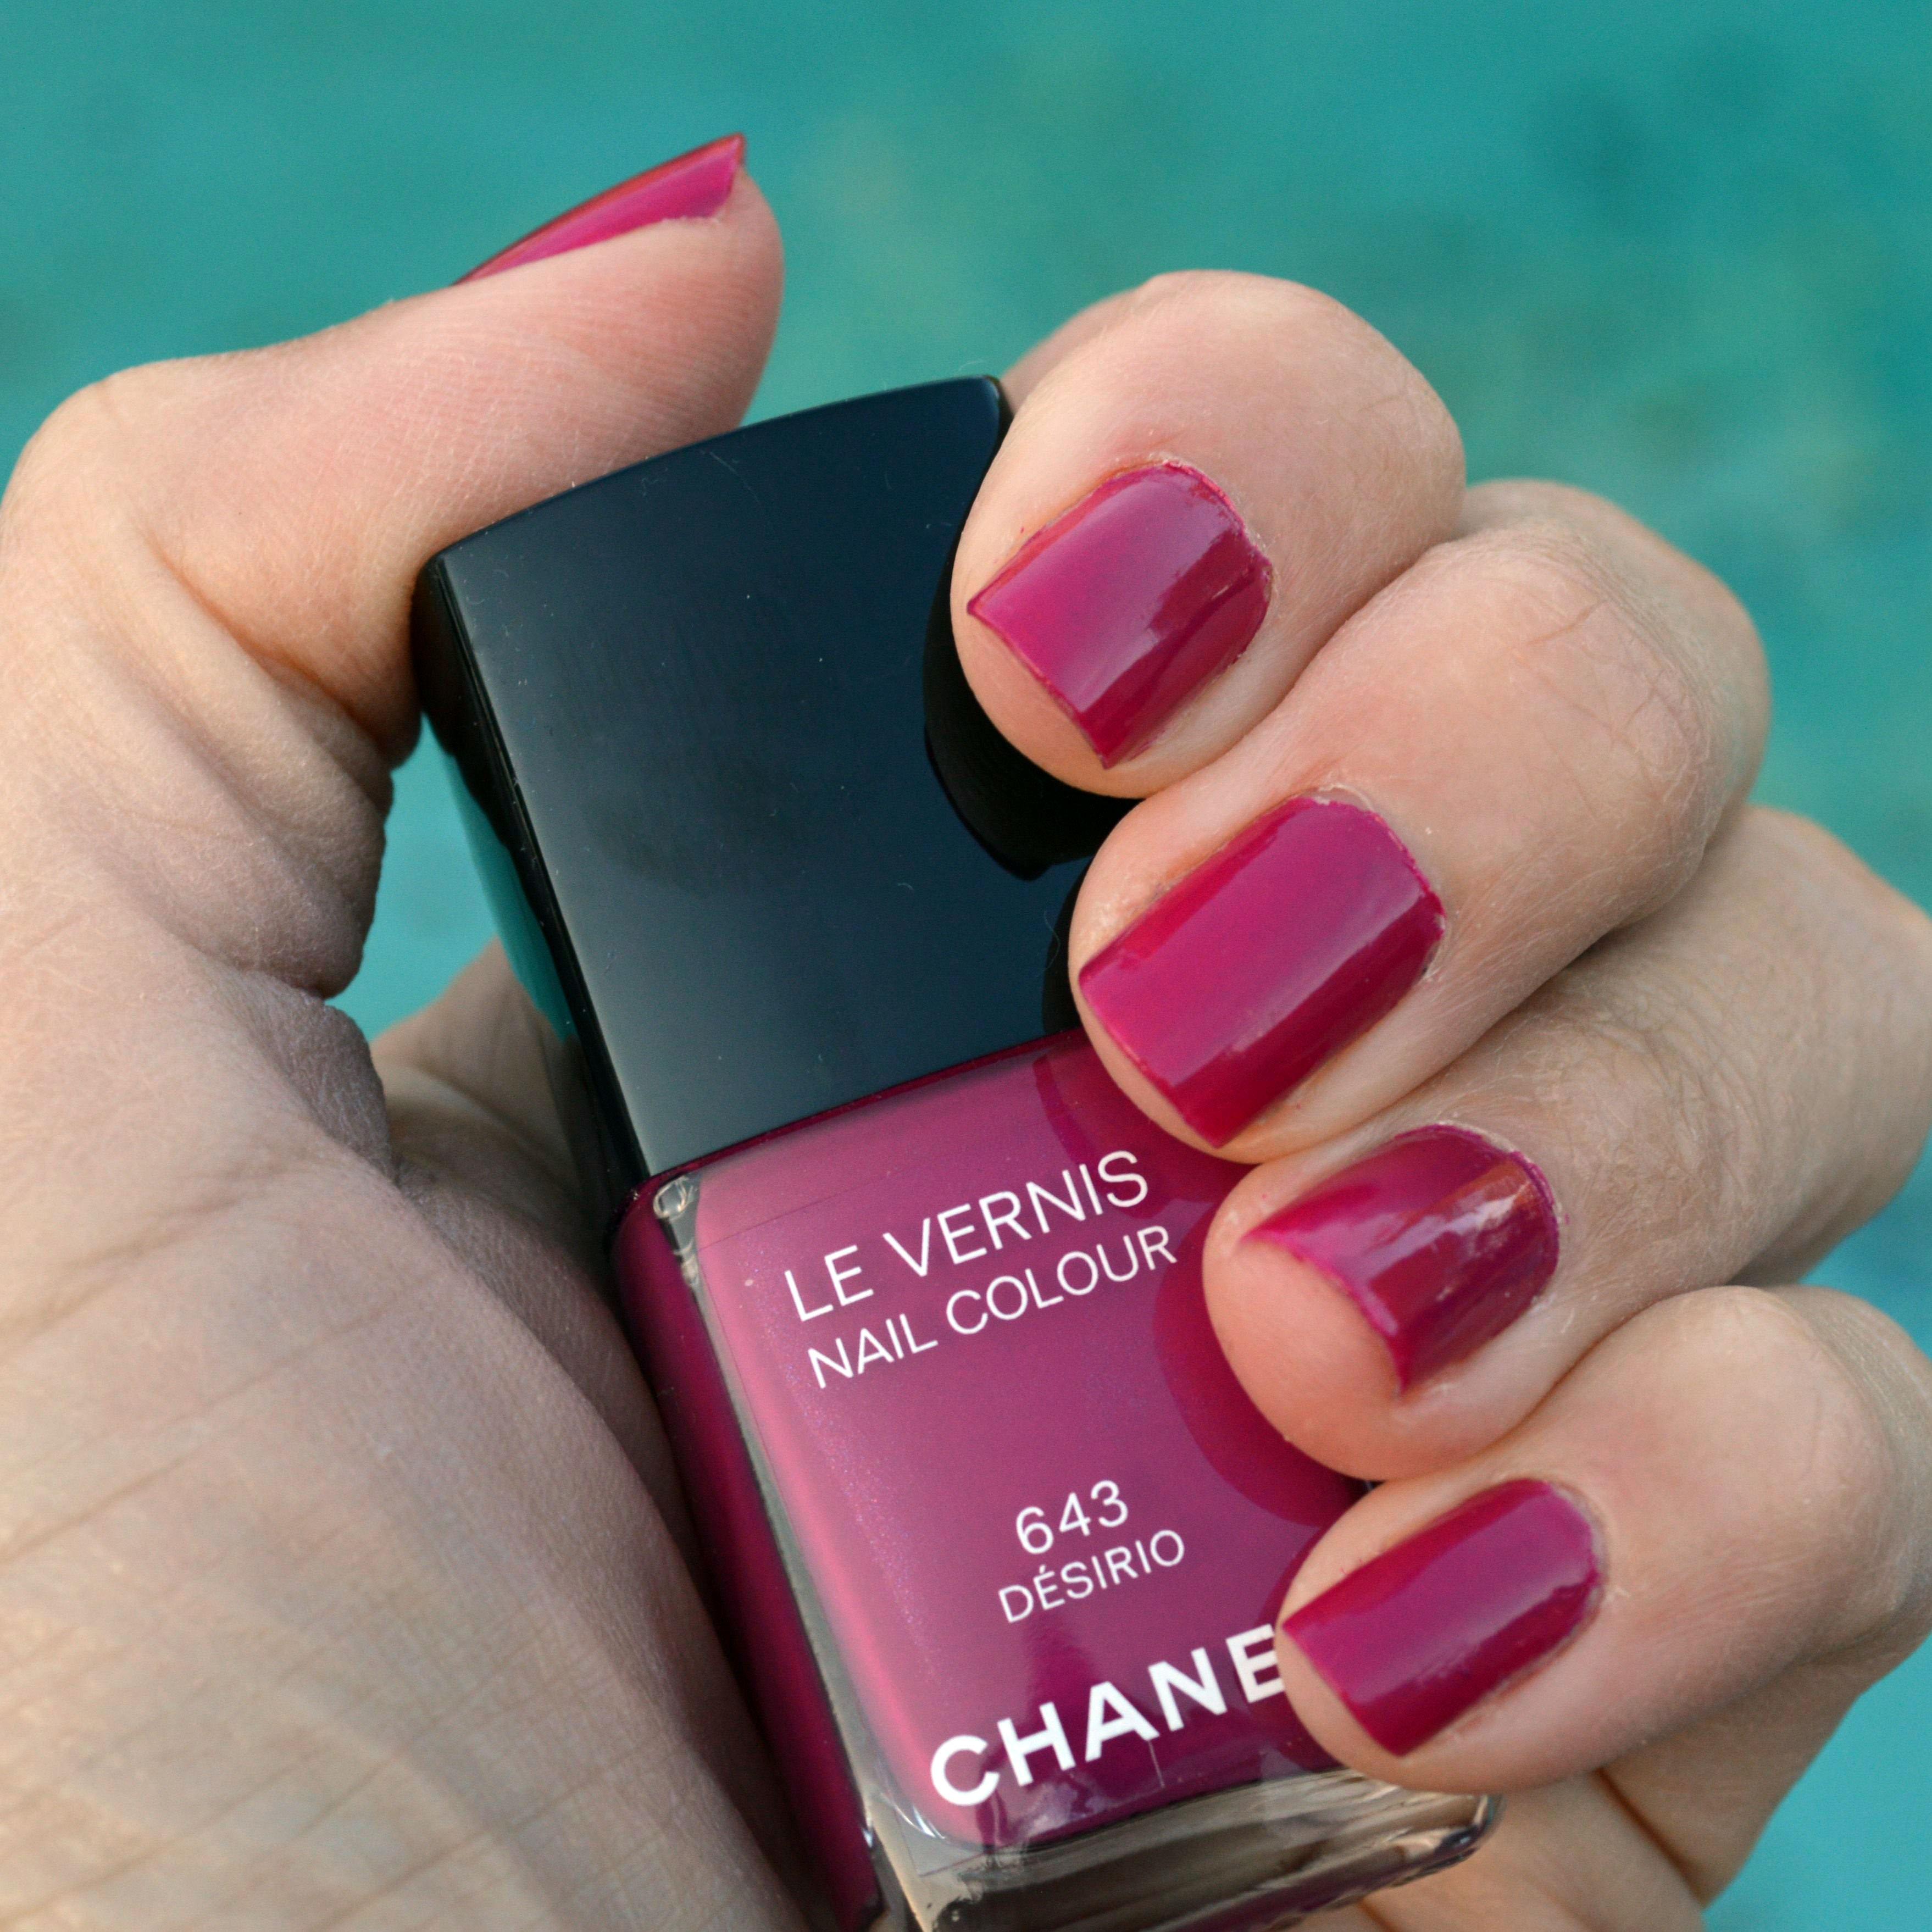 Chanel Desirio nail polish spring 2015 review | Bay Area Fashionista